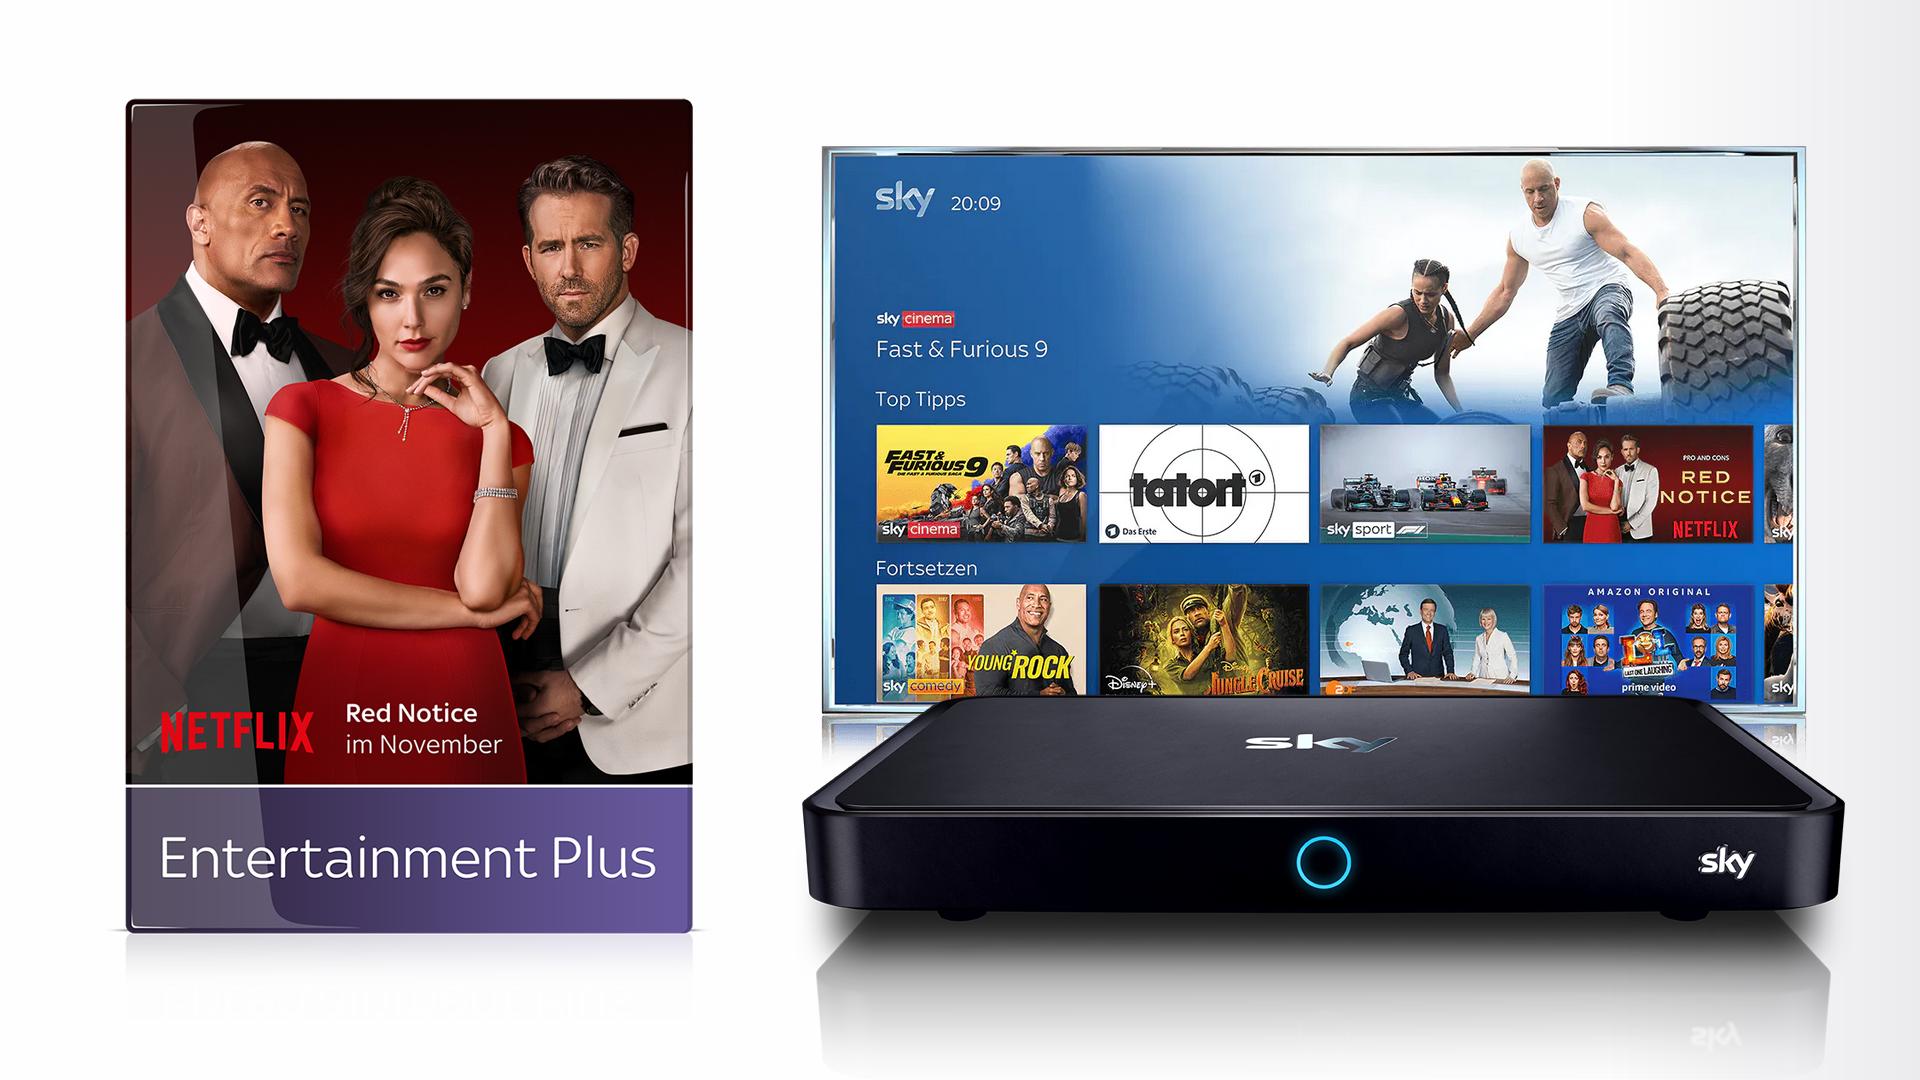 Sky Entertainment Plus